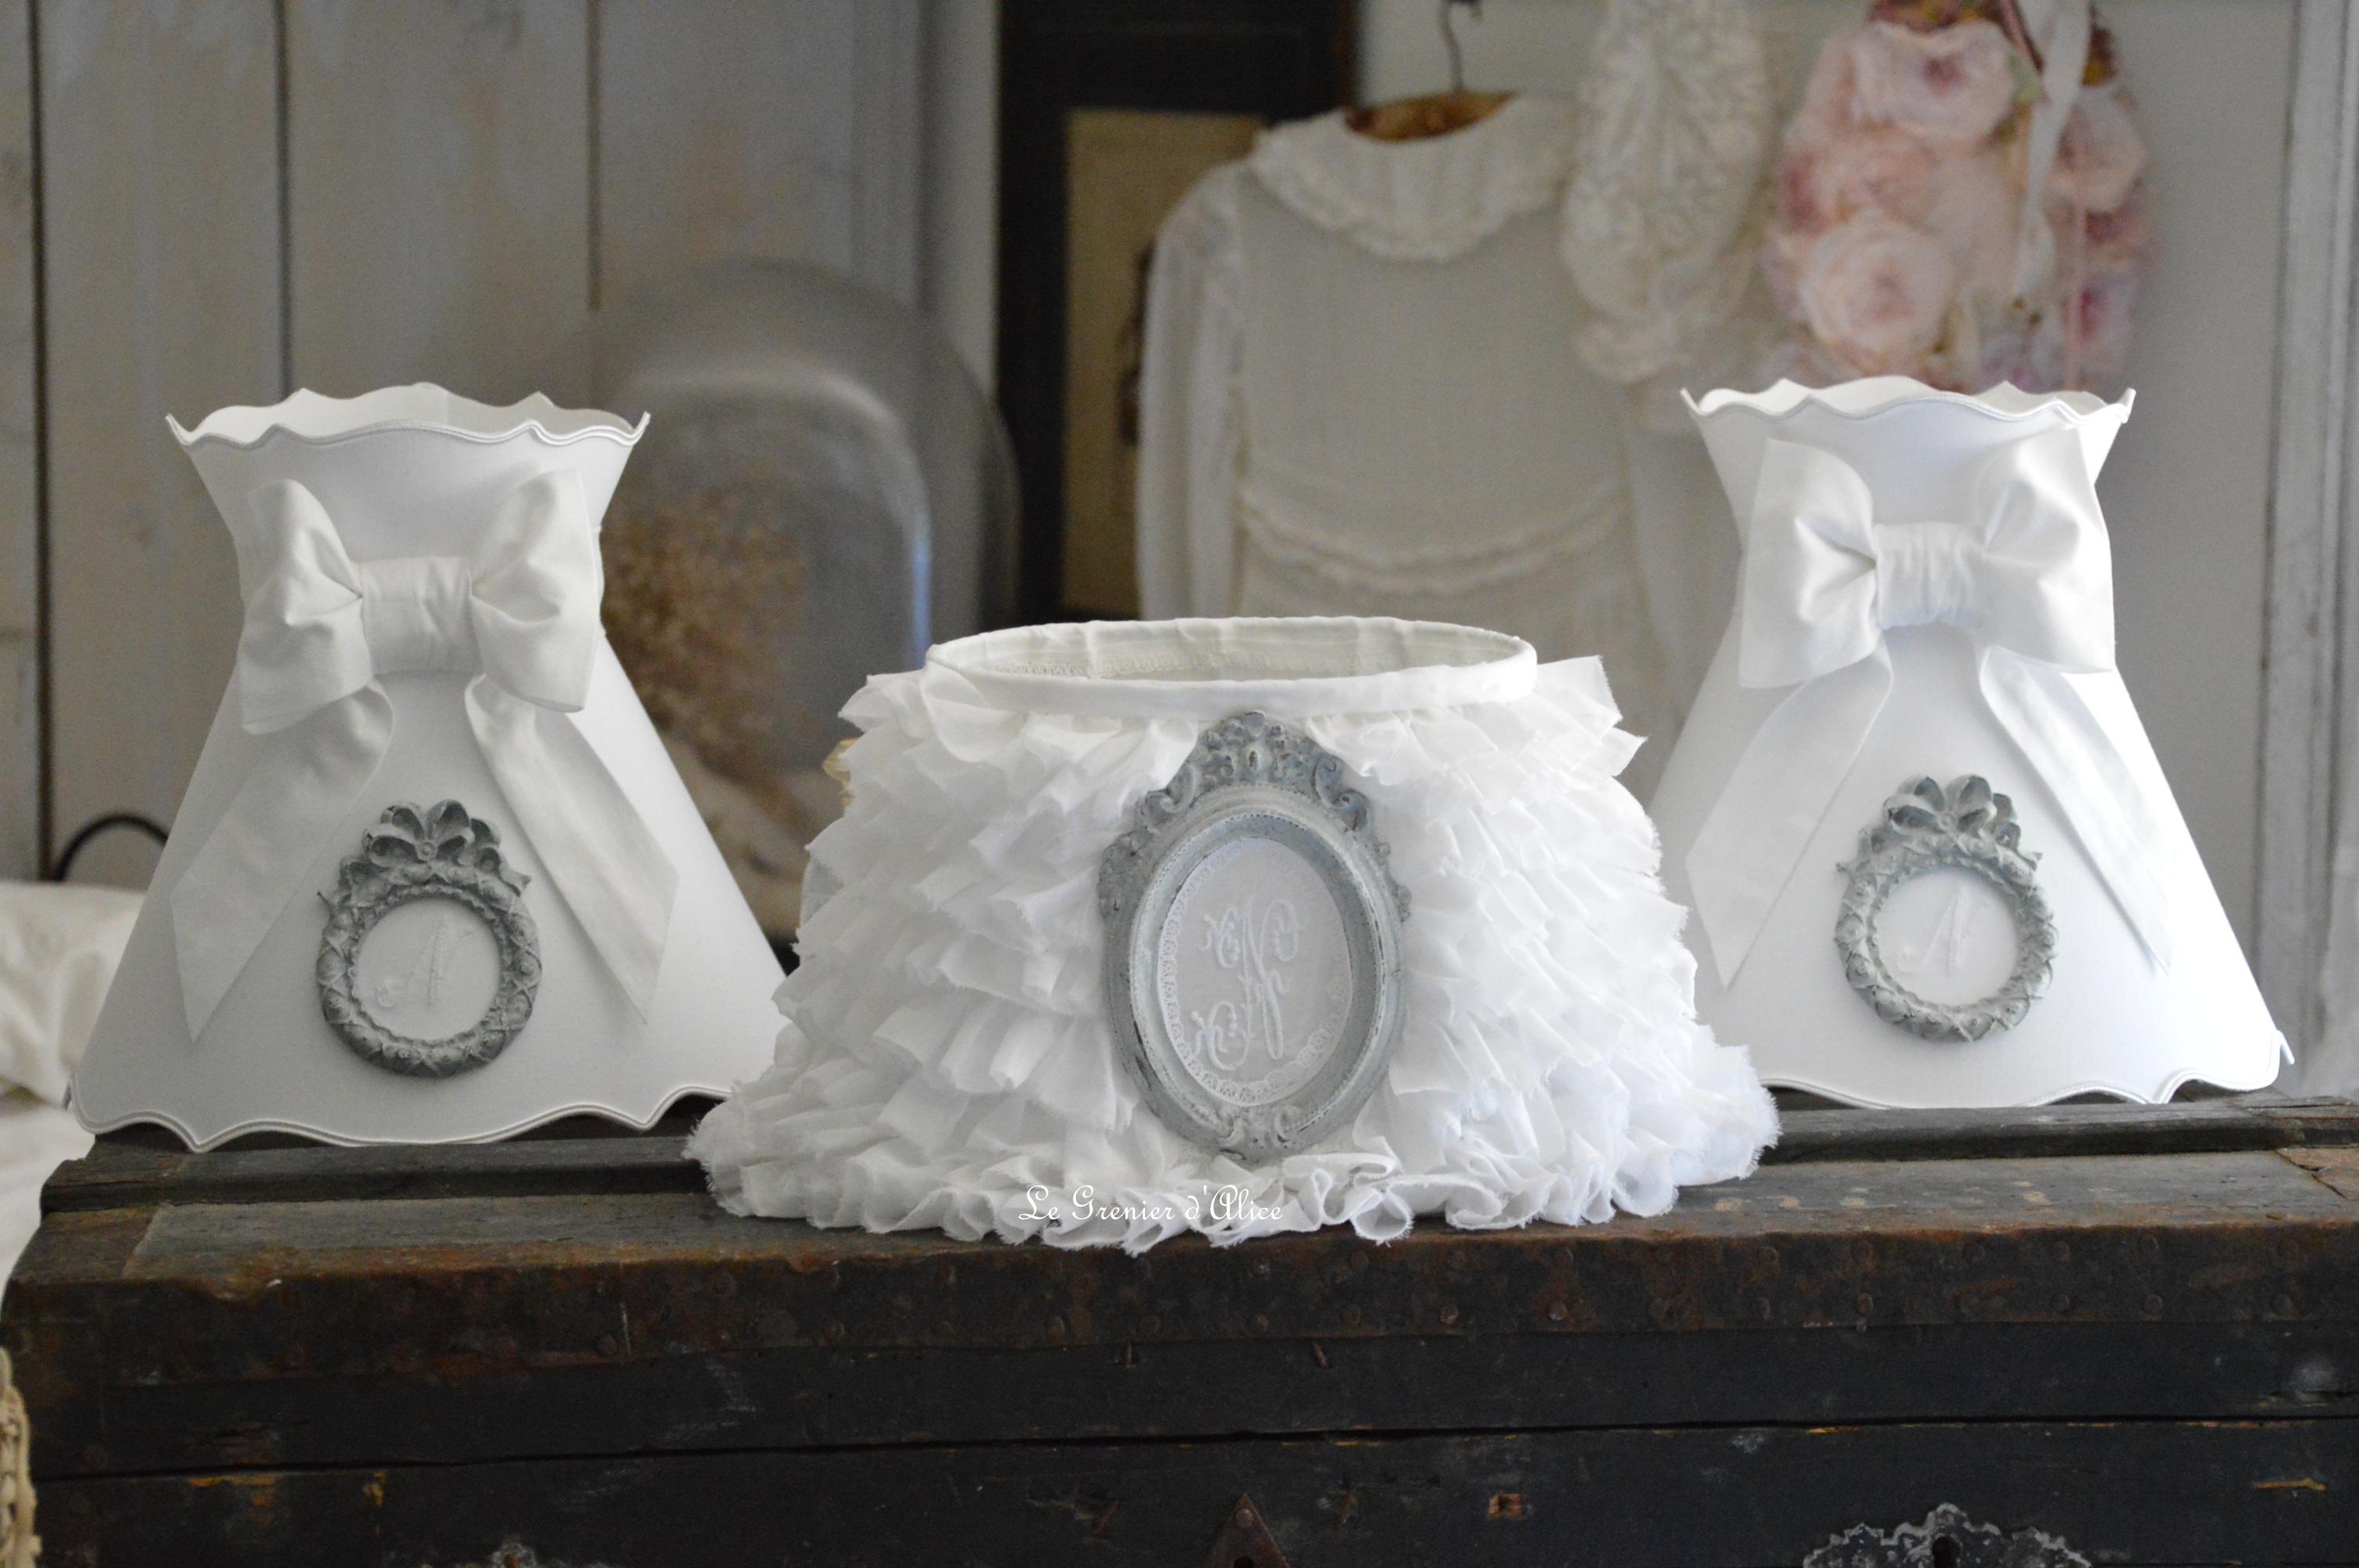 Abat jour oval froufrou organdi blanc shabby chic et romantique monogramme ornement patiné gris gustavien Shabby ruffle lampshade 3